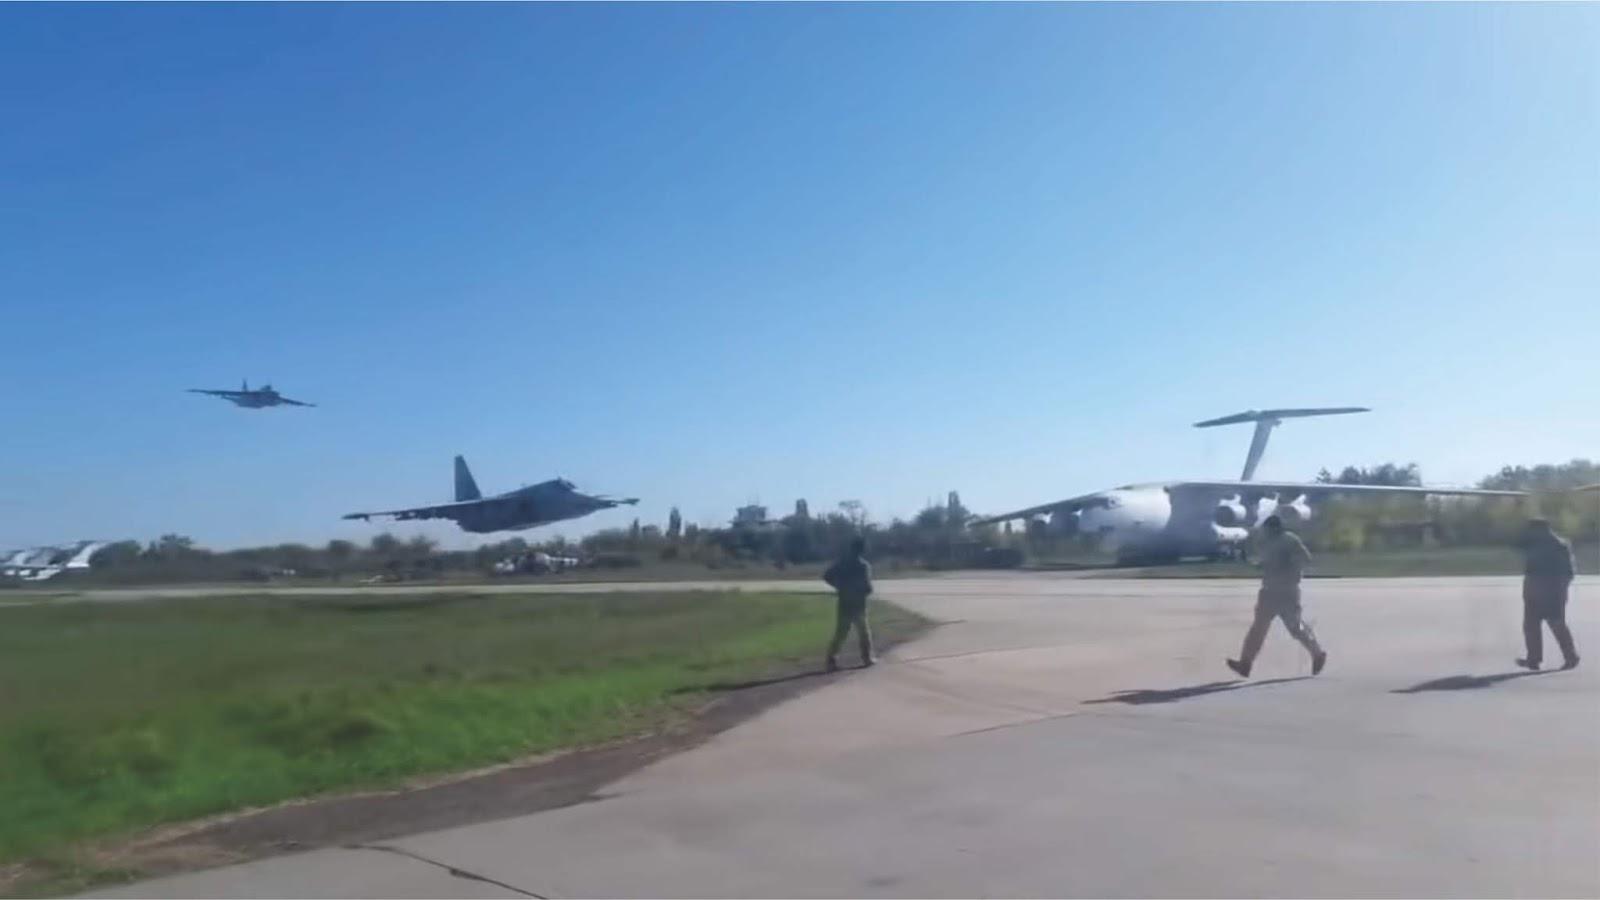 Spektakuler Su-25 Ukraina terbang sangat rendah hampir menyentuh landasan